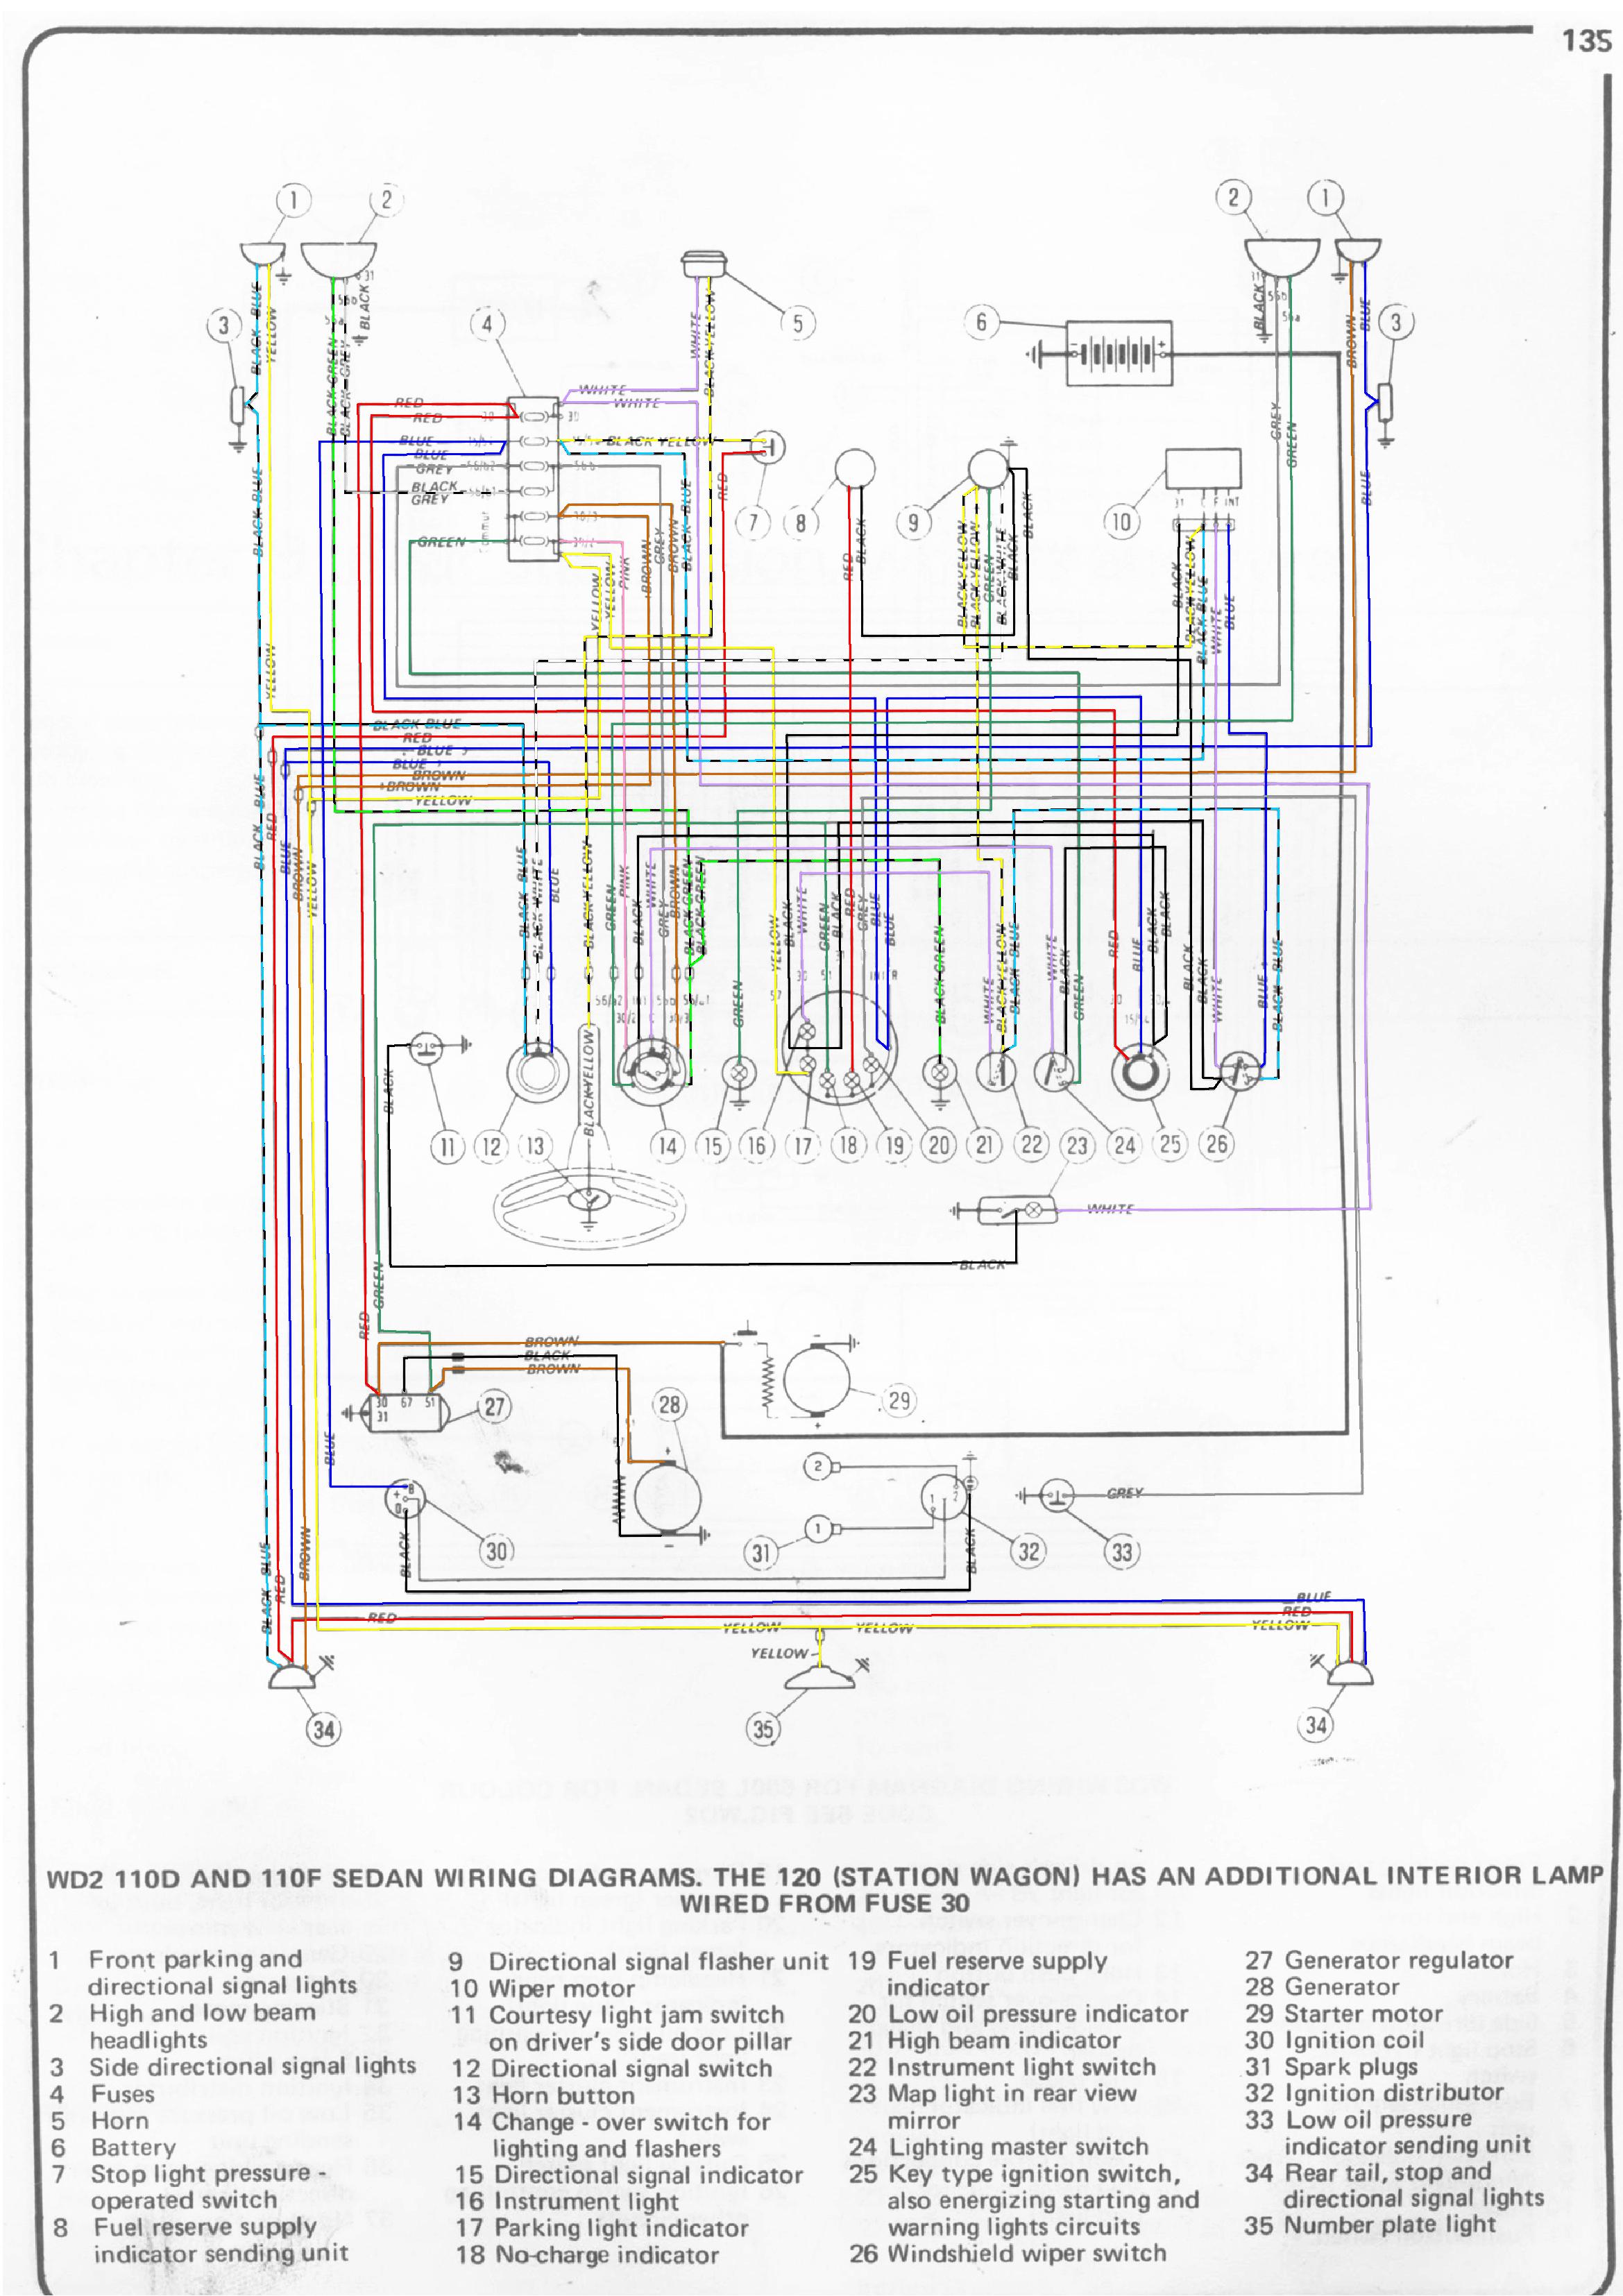 Fiat Doblo Cargo Wiring Diagram Central Locking Towbar Diagramfiat Pdf Librariesfiat